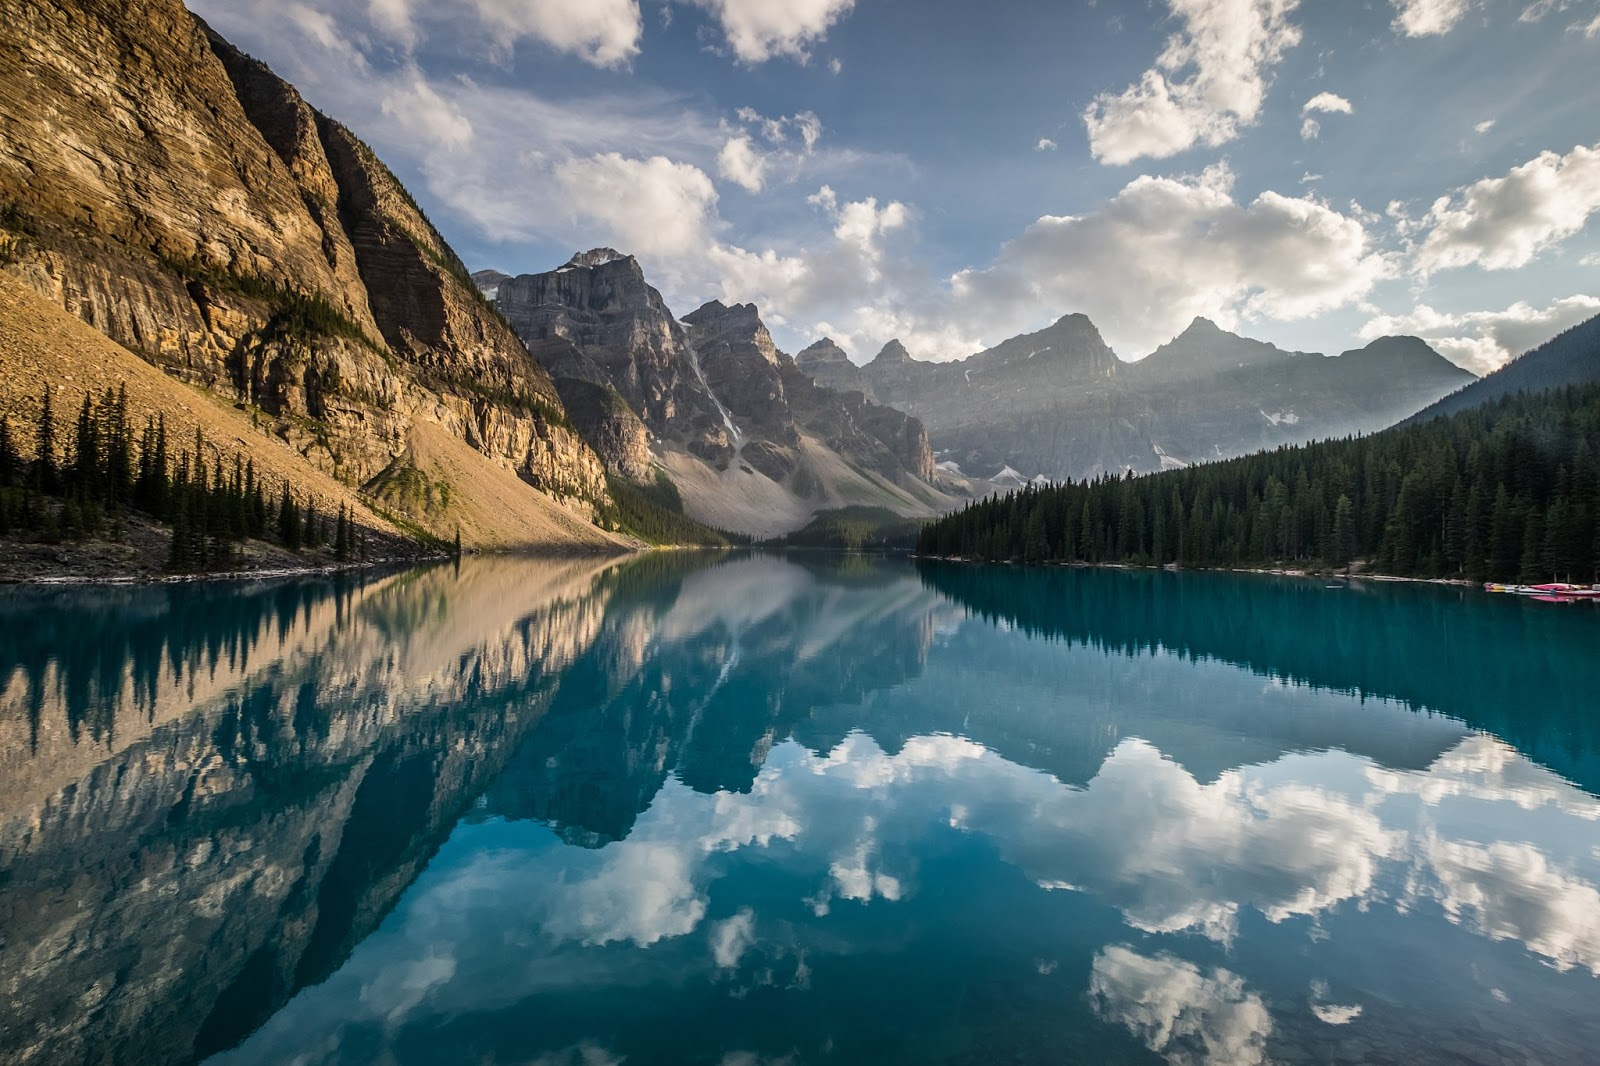 banff national park 5 - photo #1